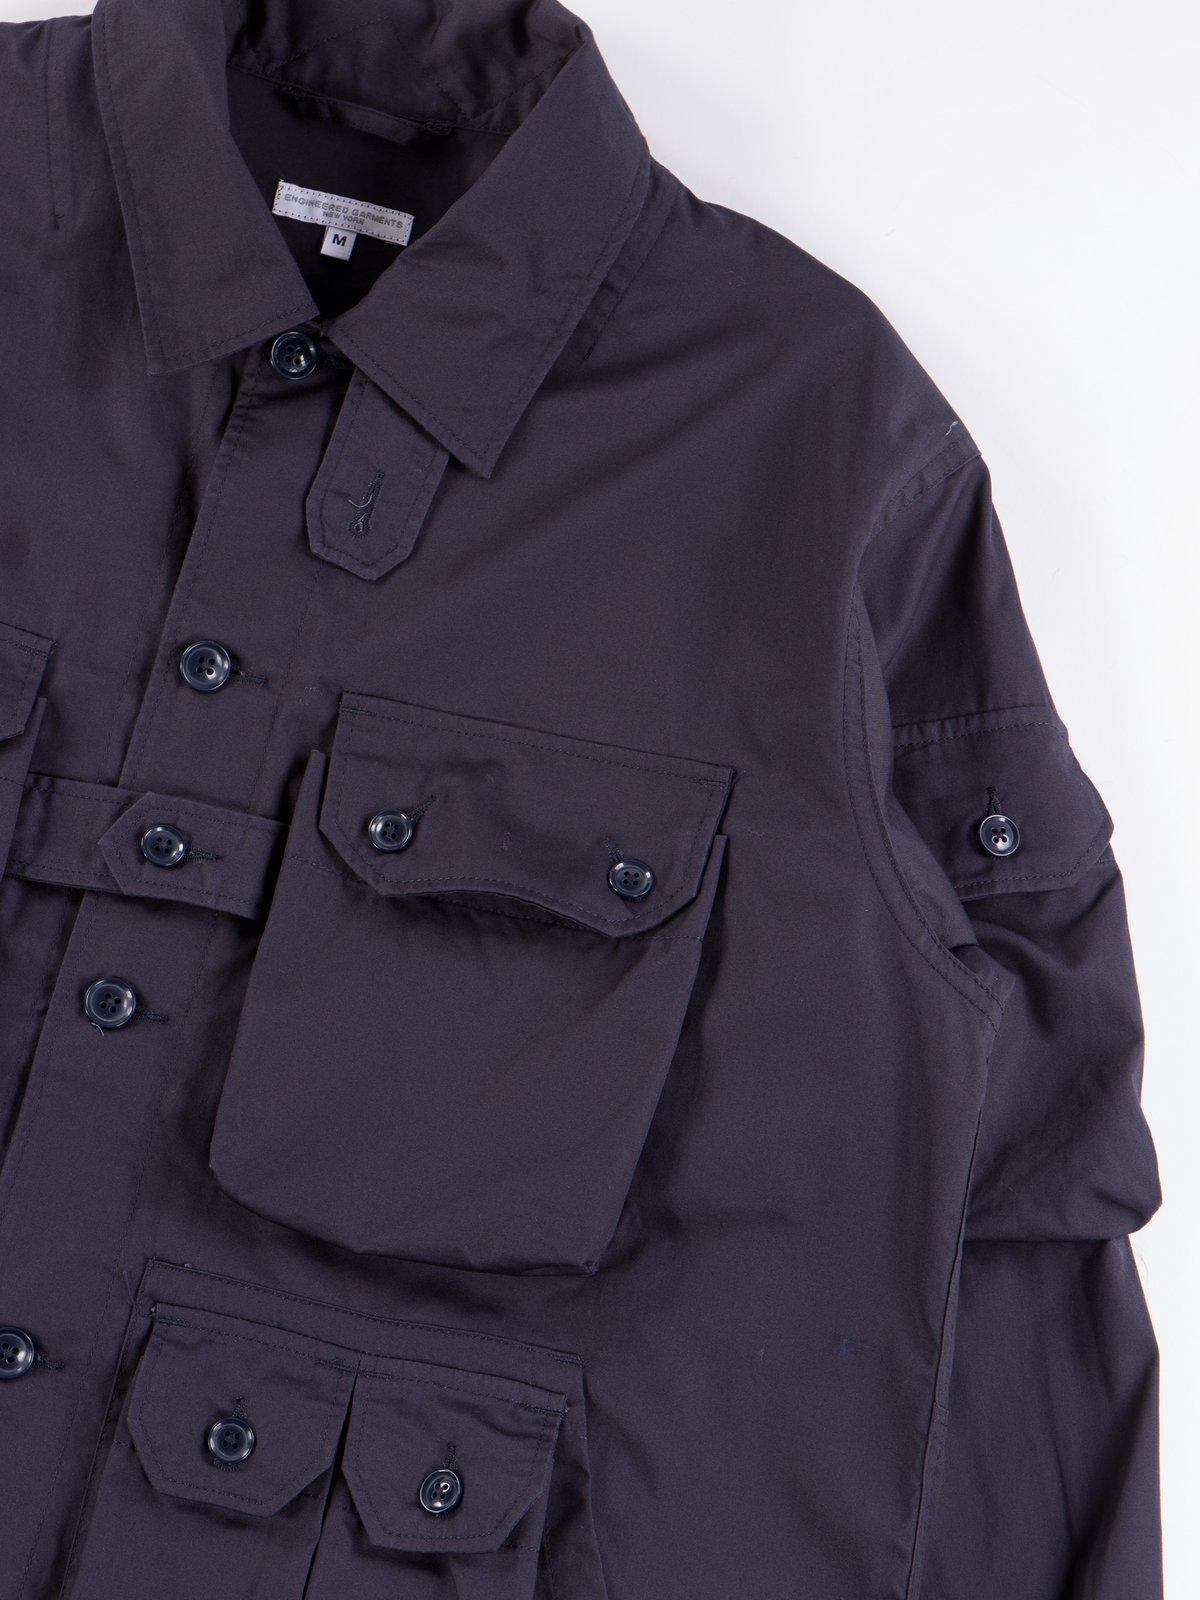 Dark Navy Highcount Twill Explorer Shirt Jacket - Image 5